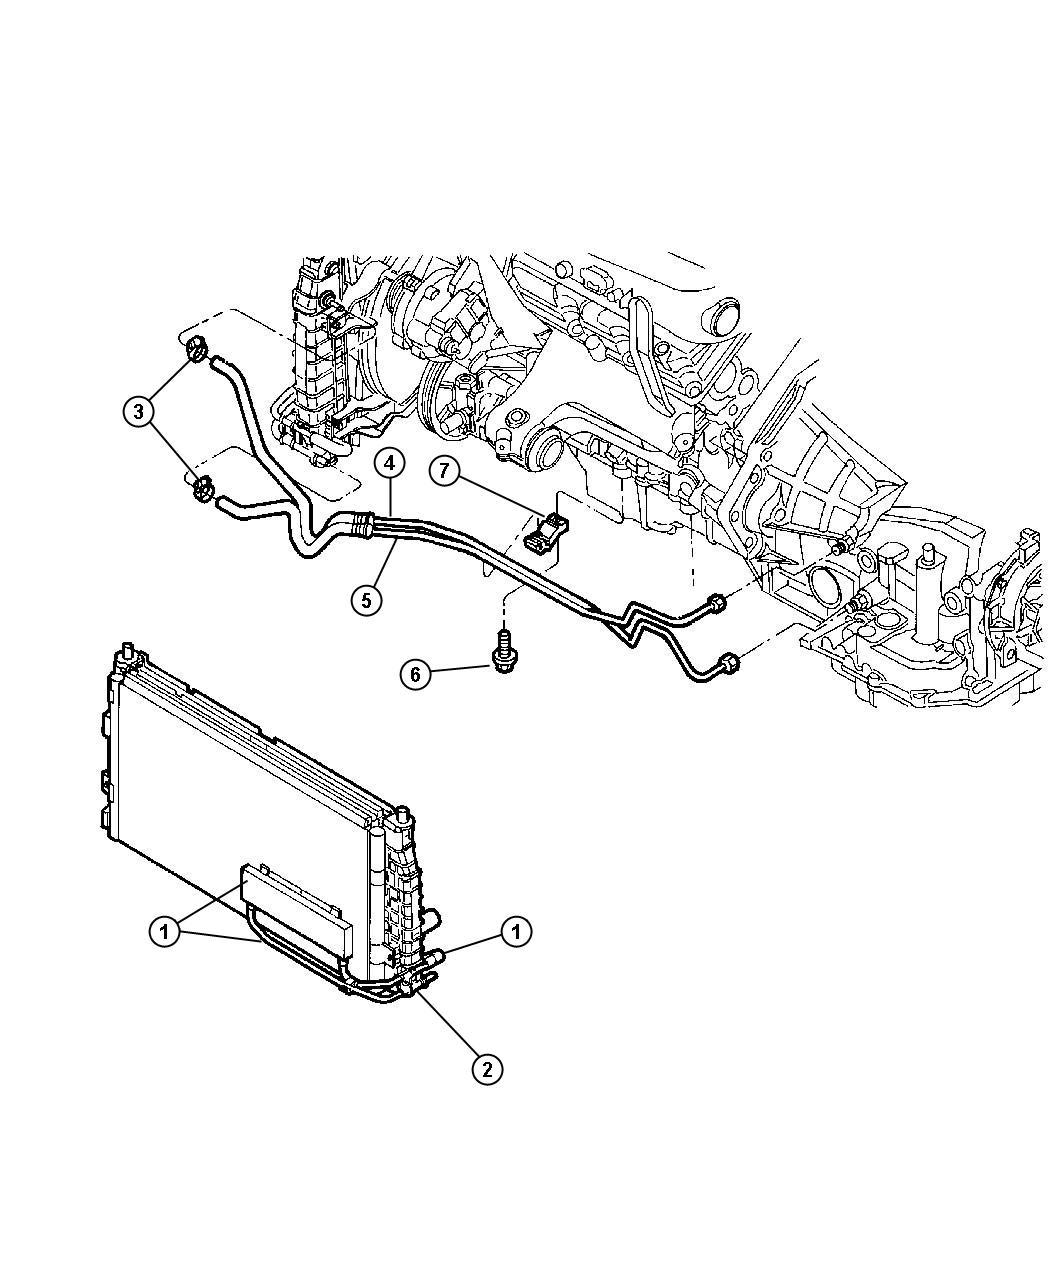 Chrysler Lhs Oil Cooler Transmission